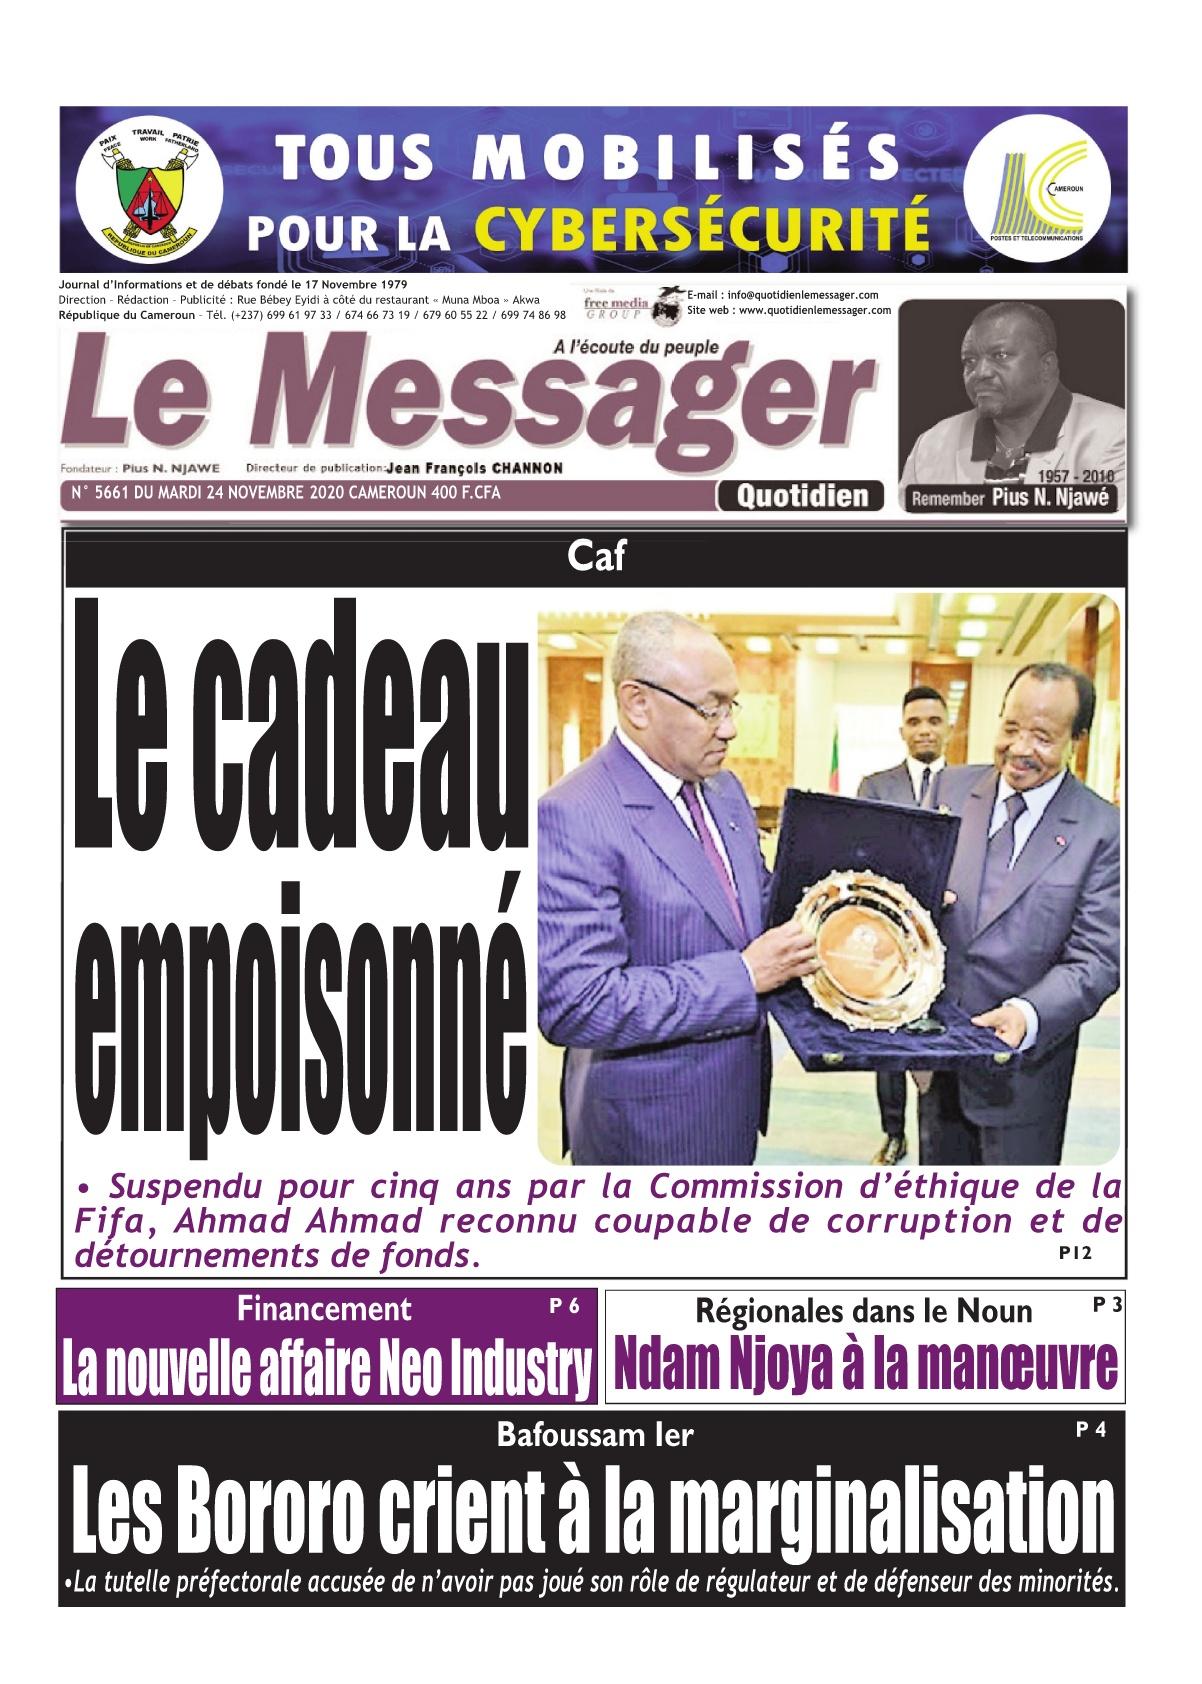 Le Messager - 24/11/2020